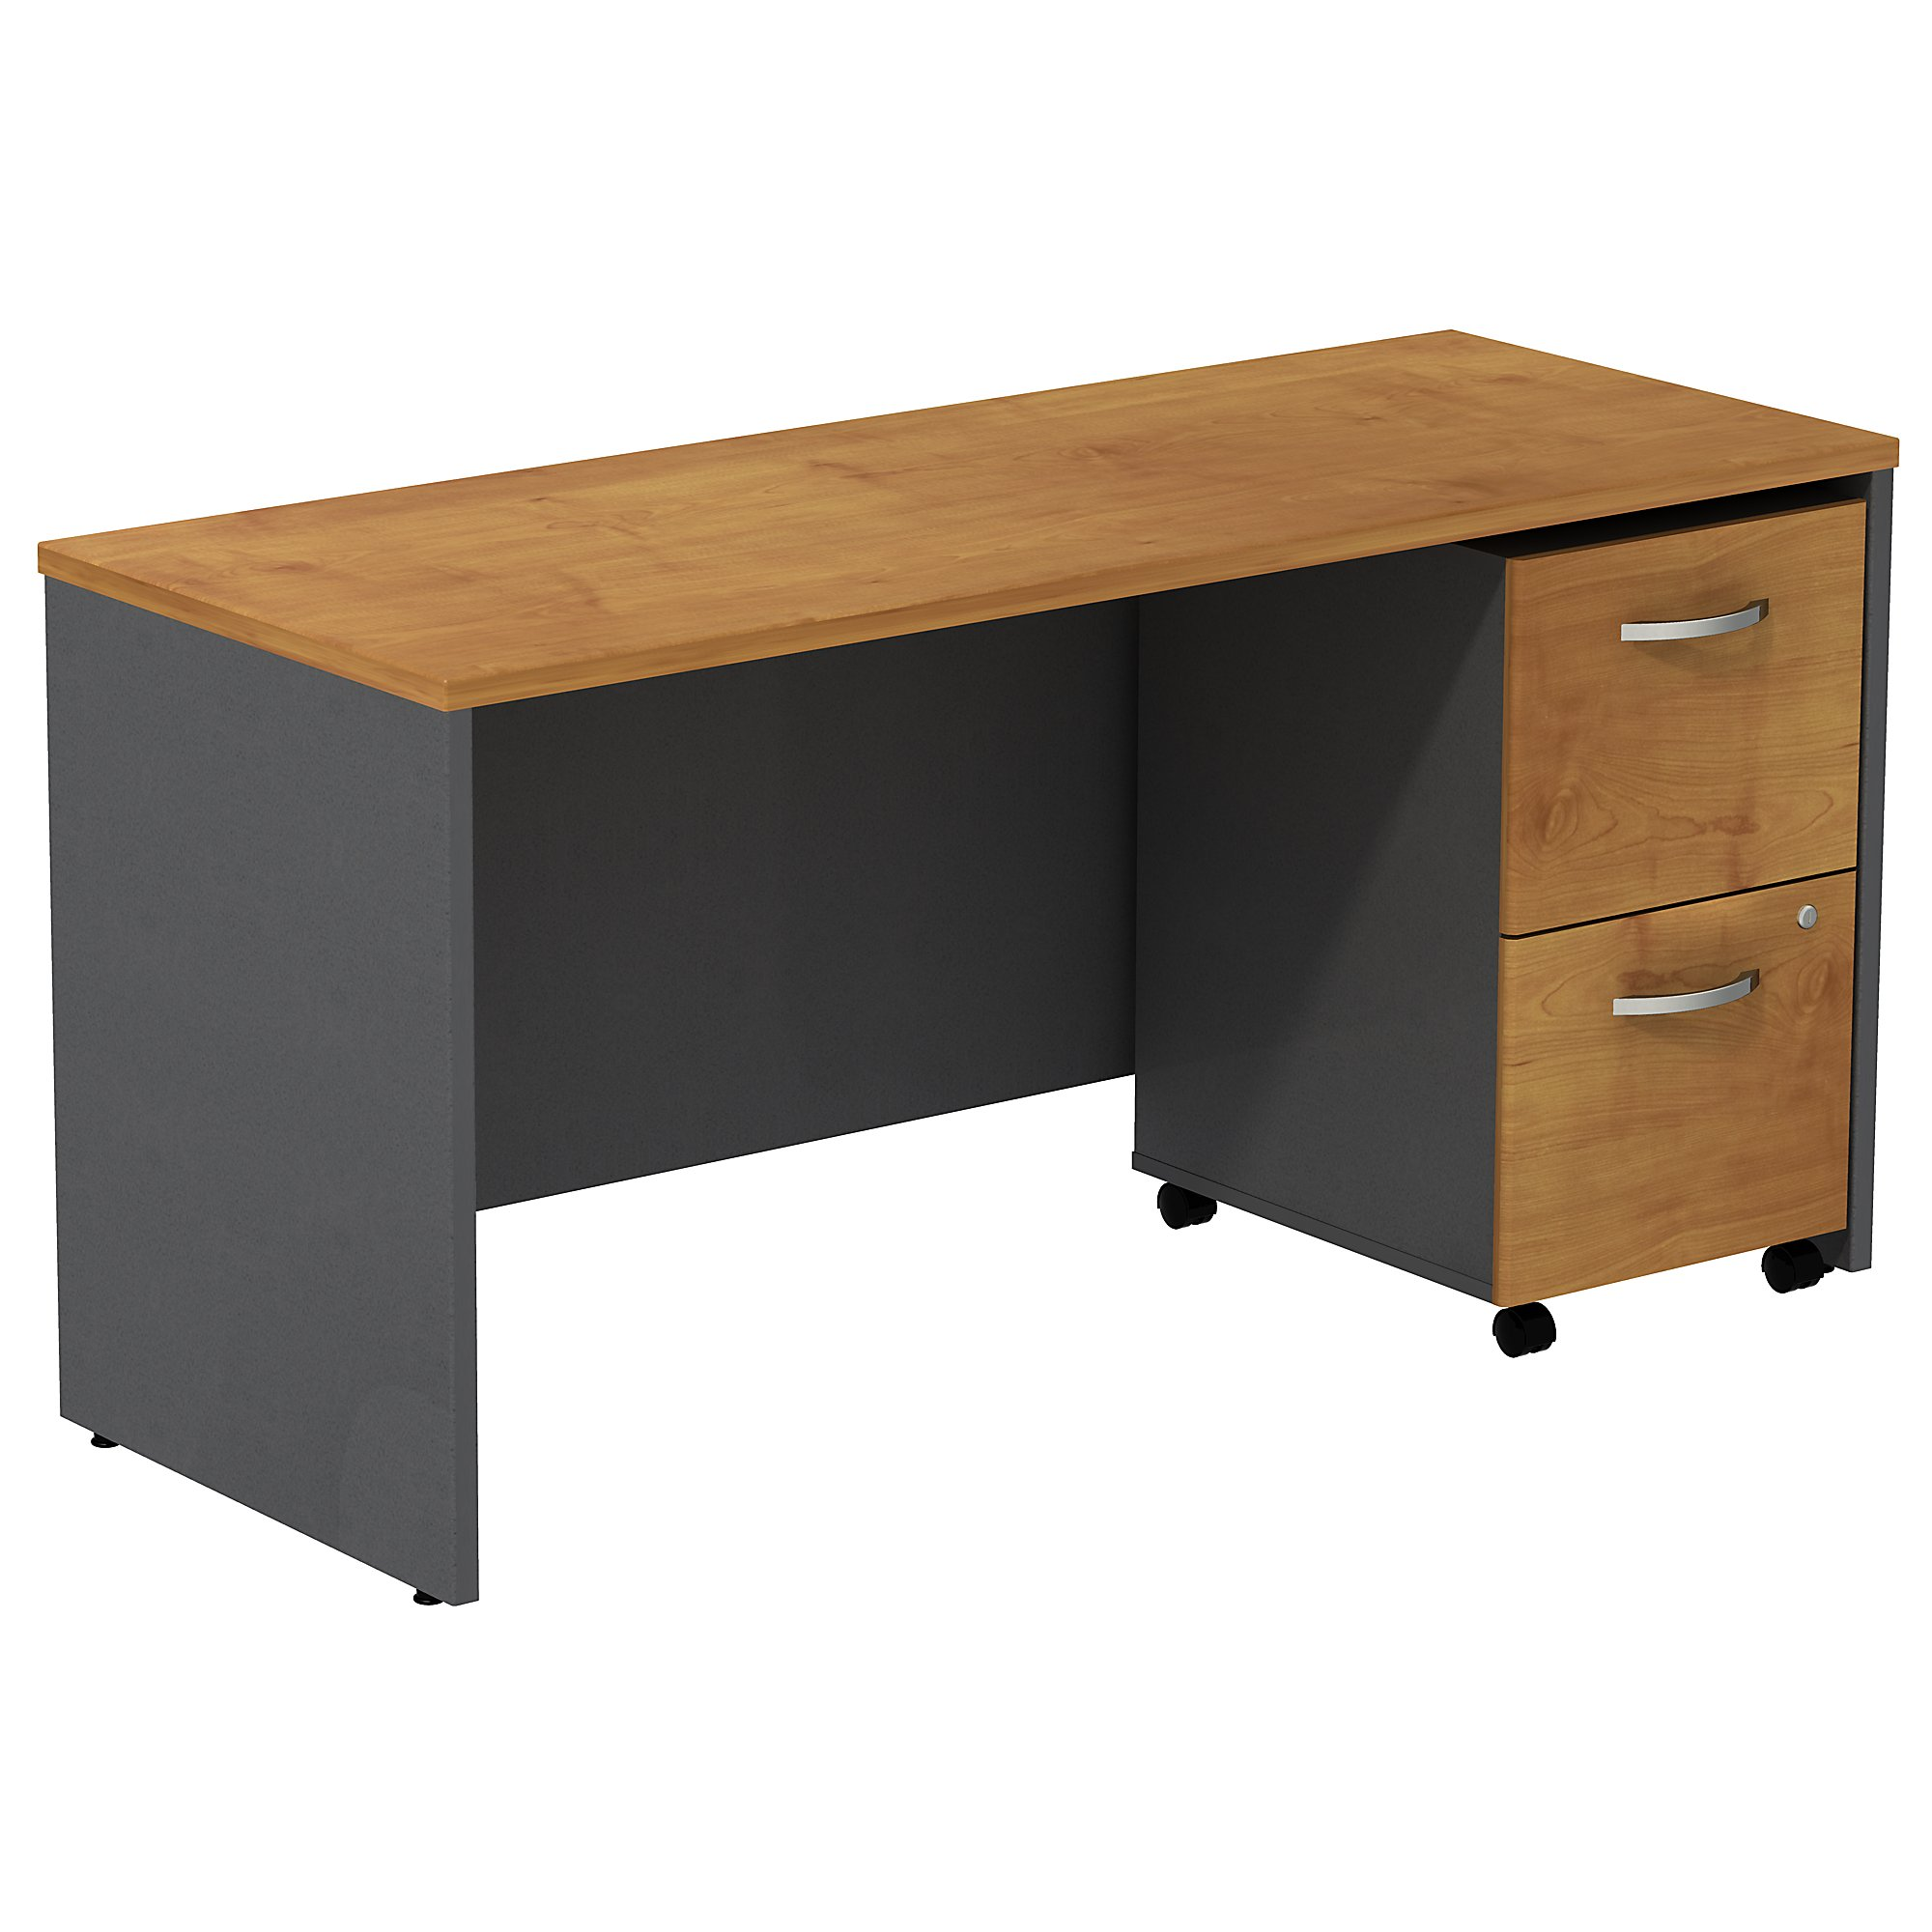 "natural cherry series c 60"" credenza desk"